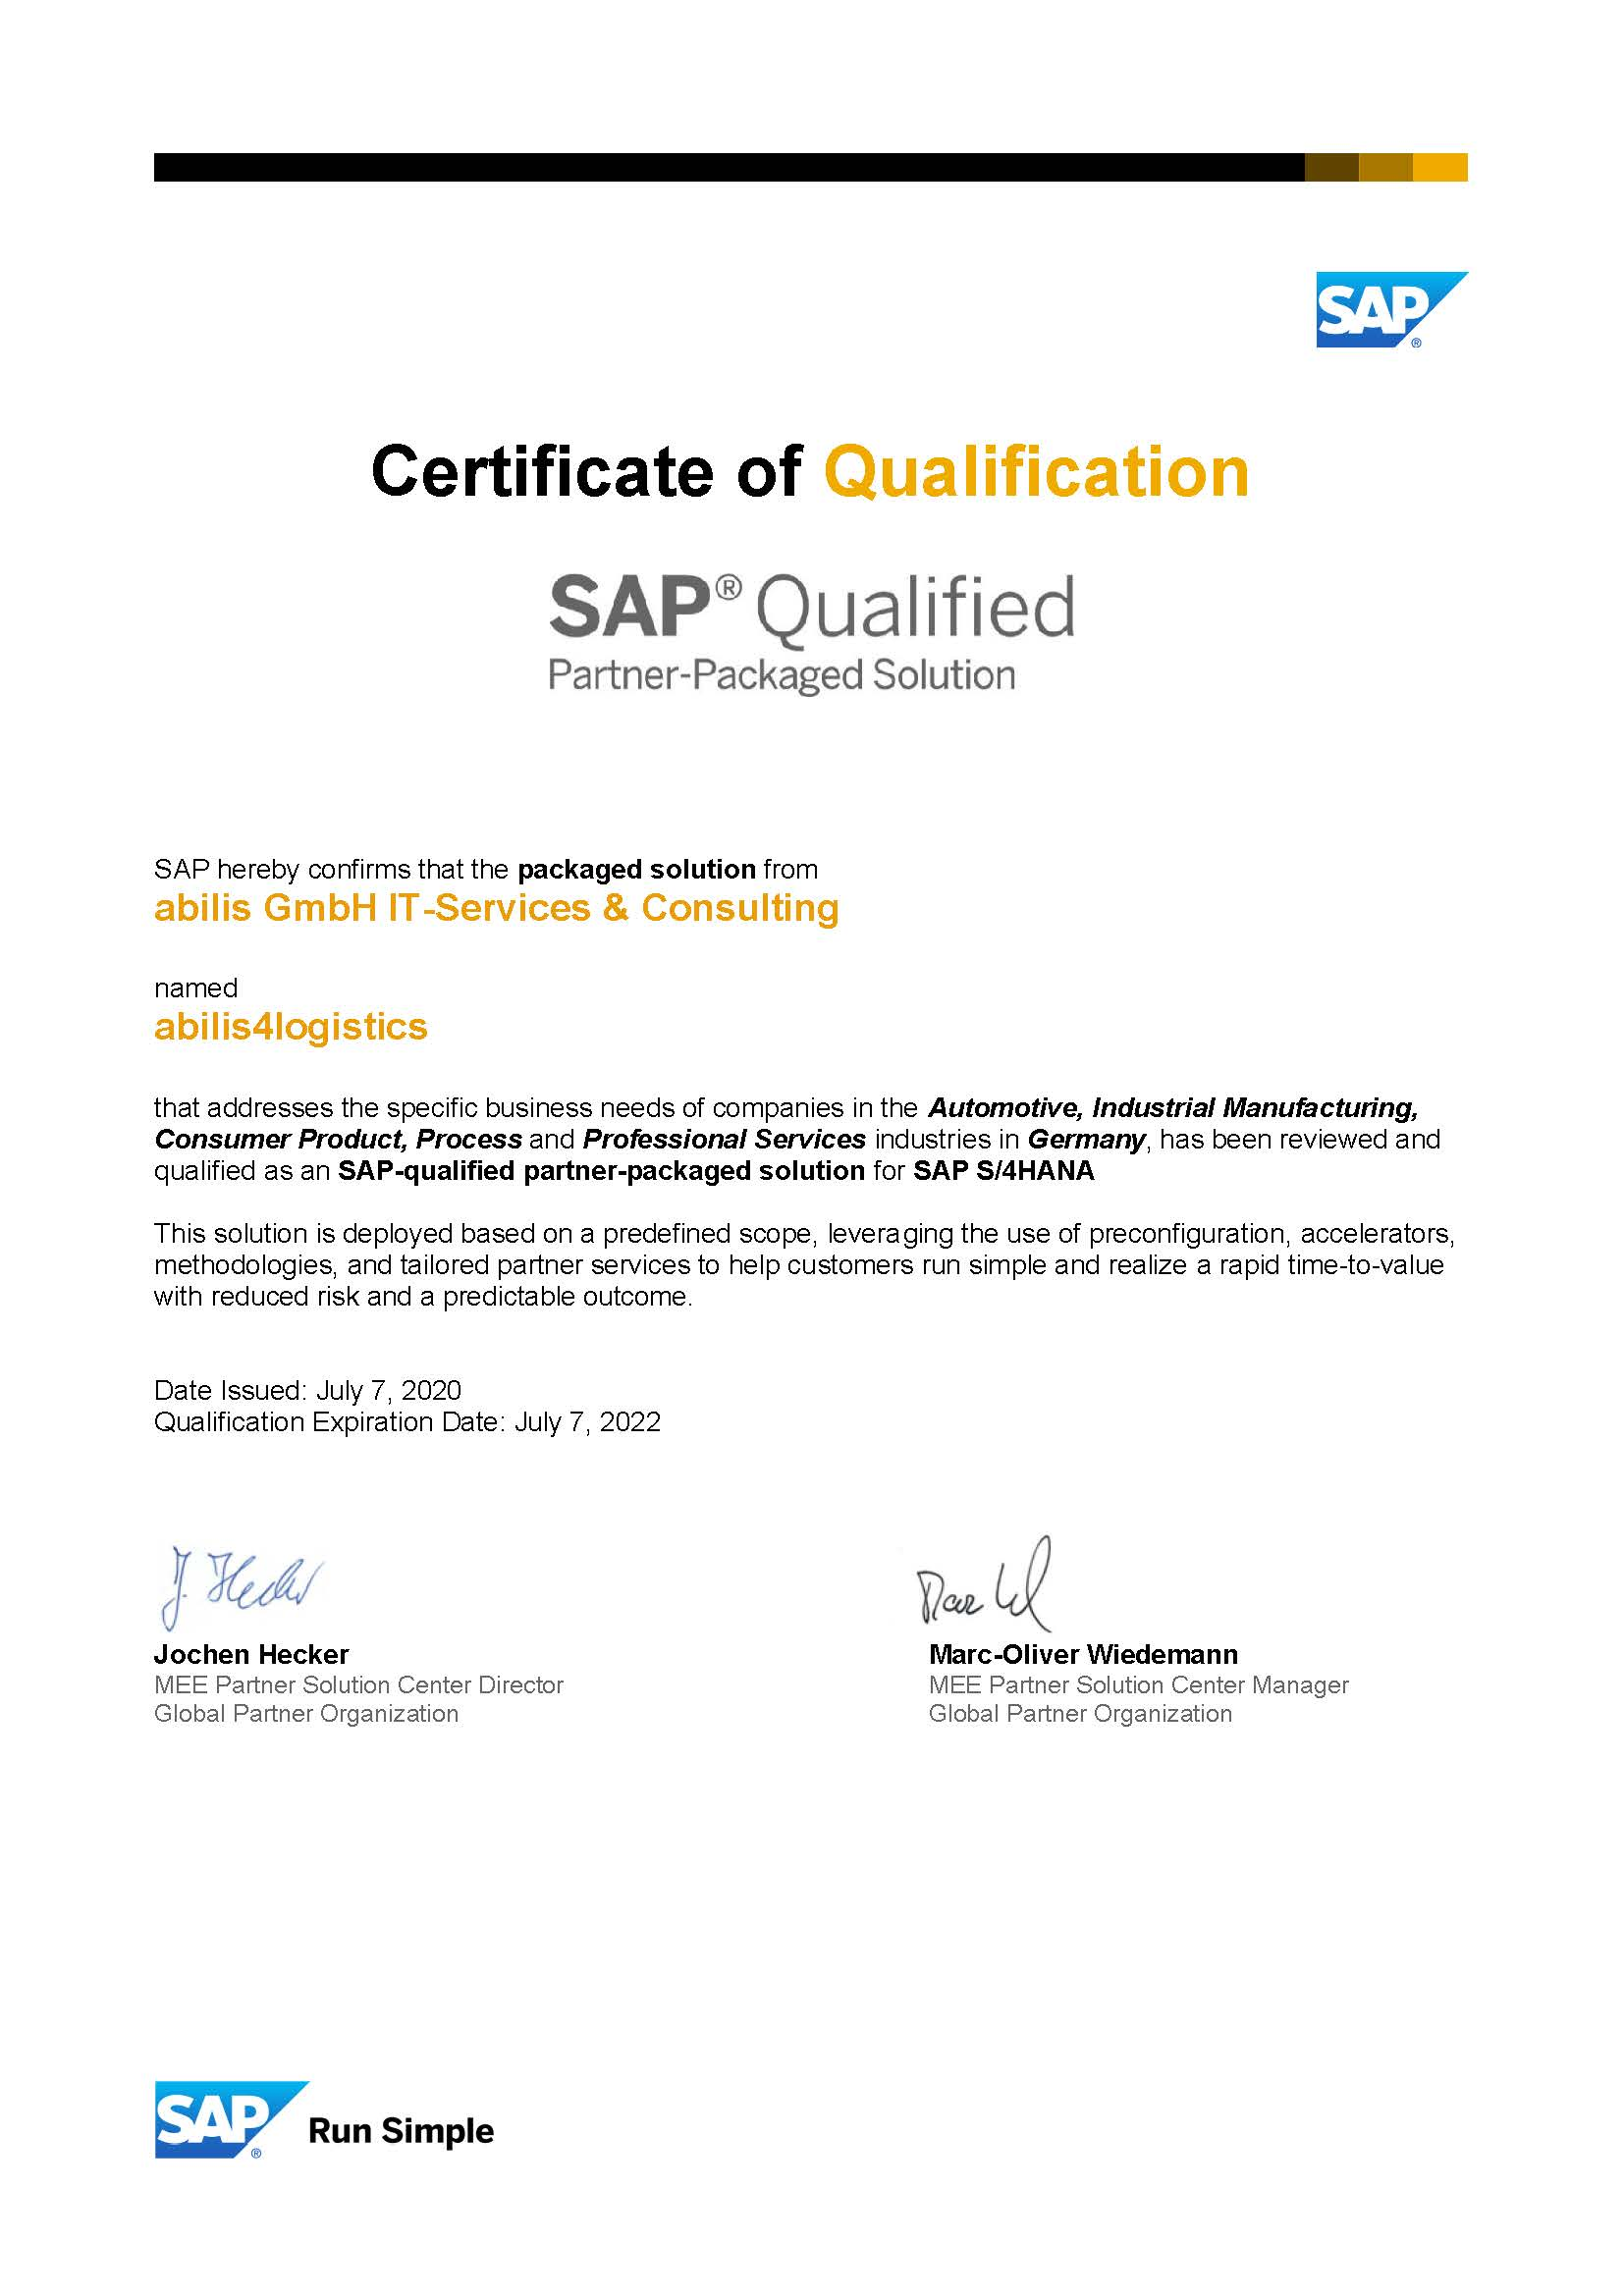 Zertifikat S/4HANA Branchenlösung abilis4logistics